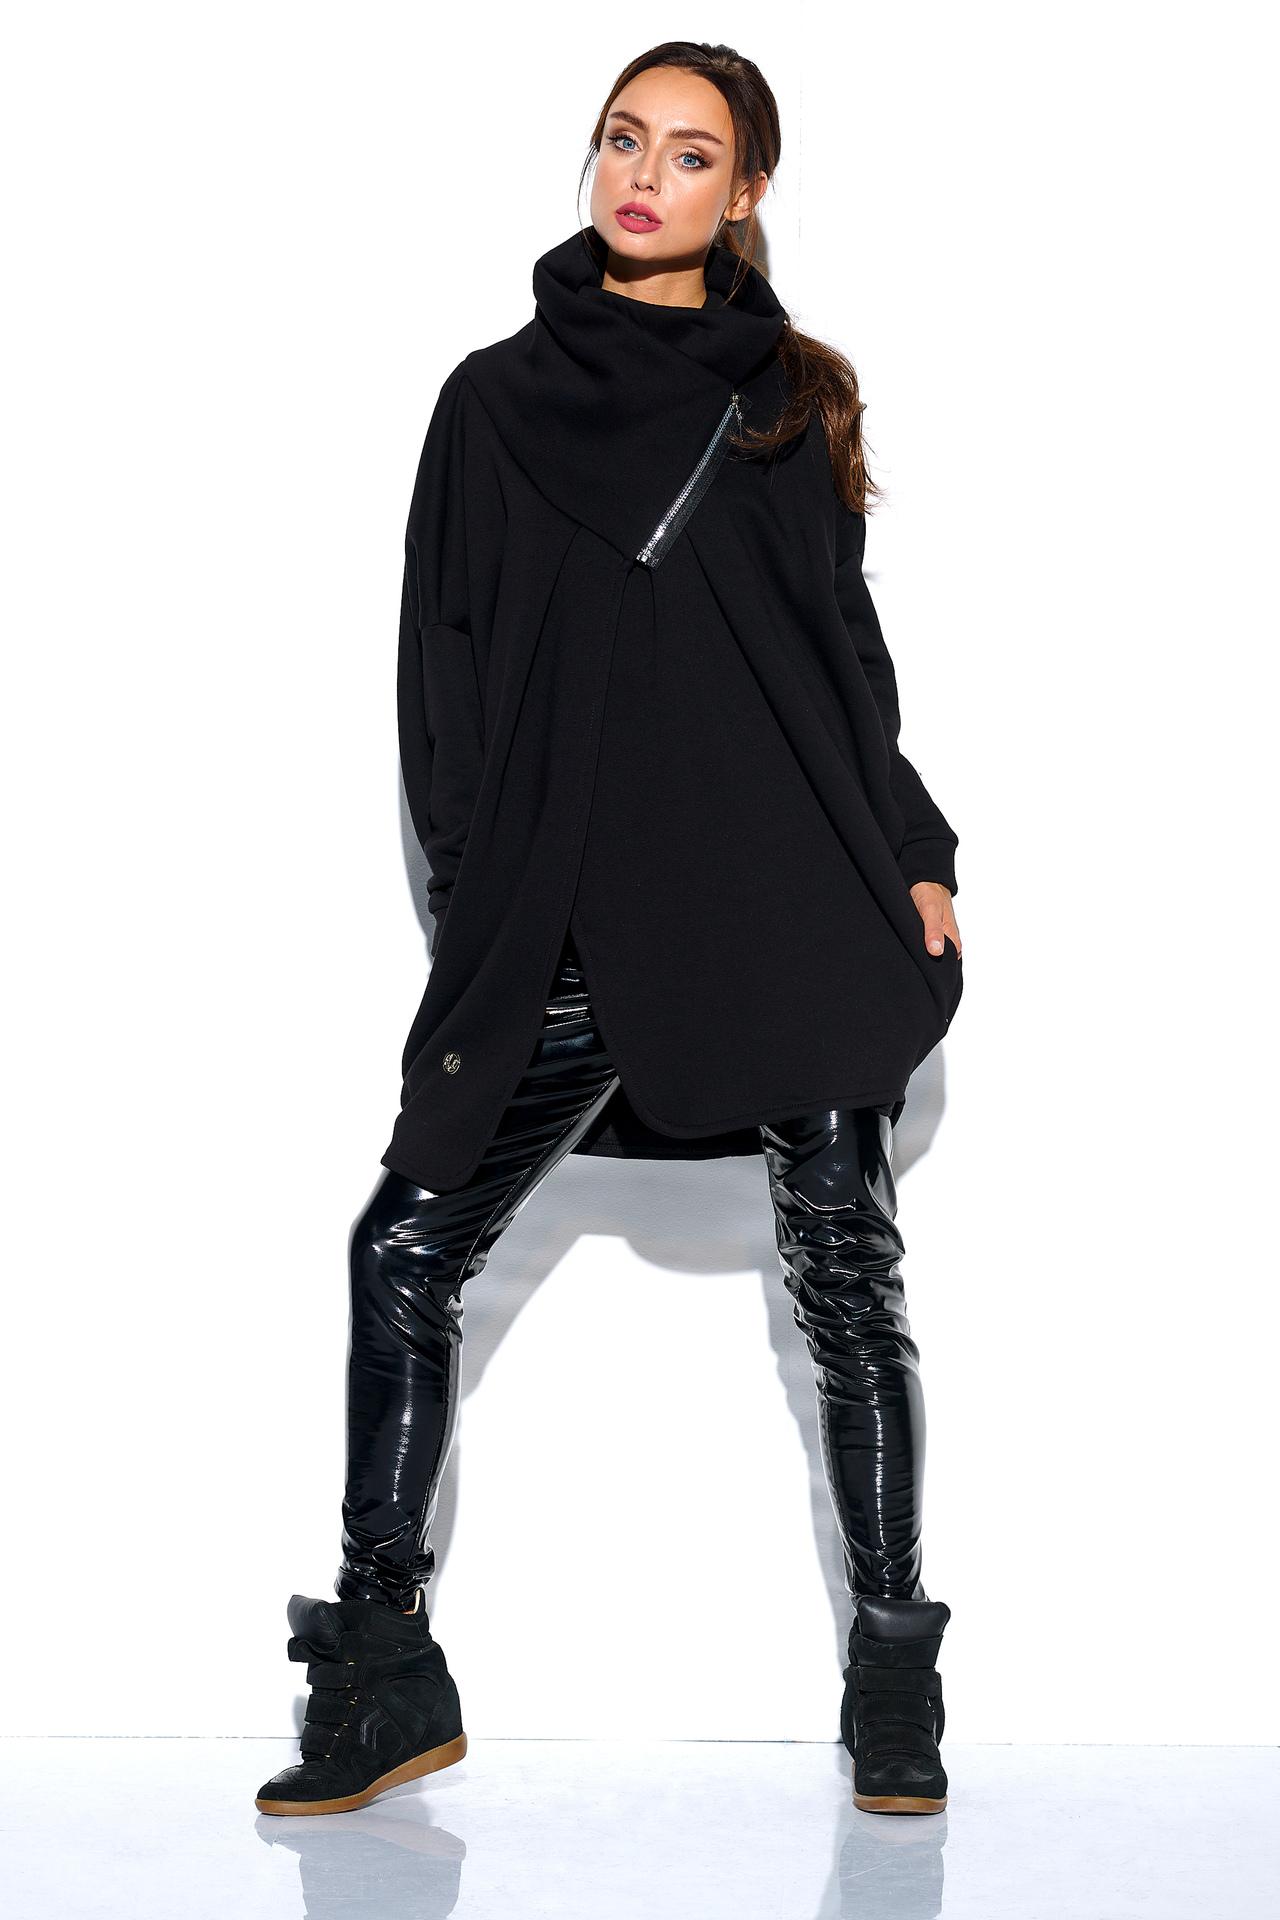 Schwarzes Oversized Sweatshirt mit Zipper